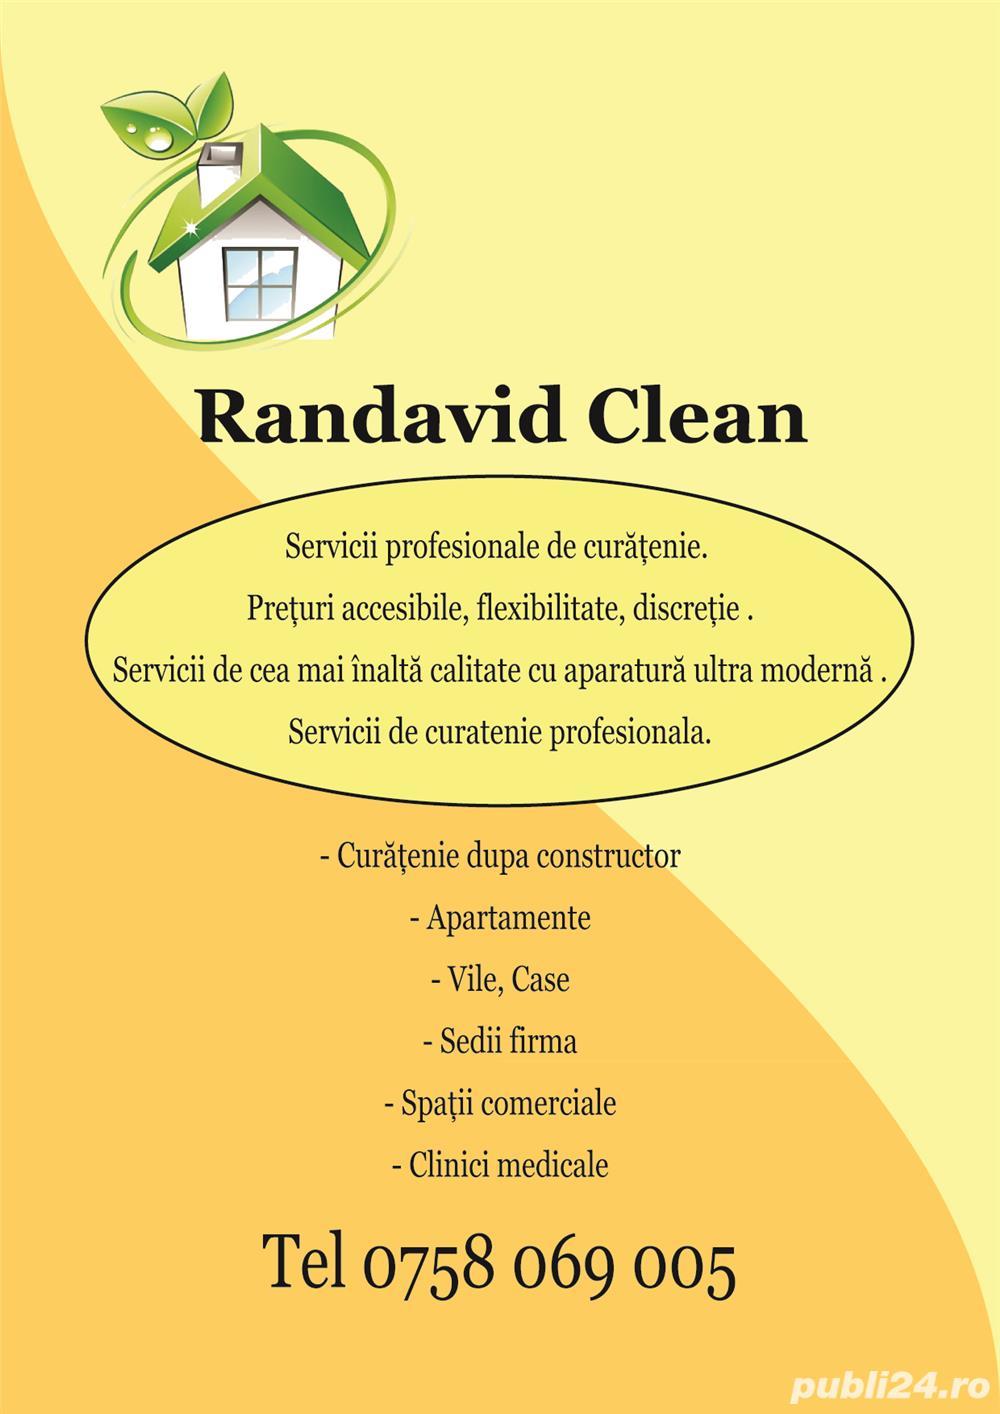 Firma curățenie RANDAVID CLEAN